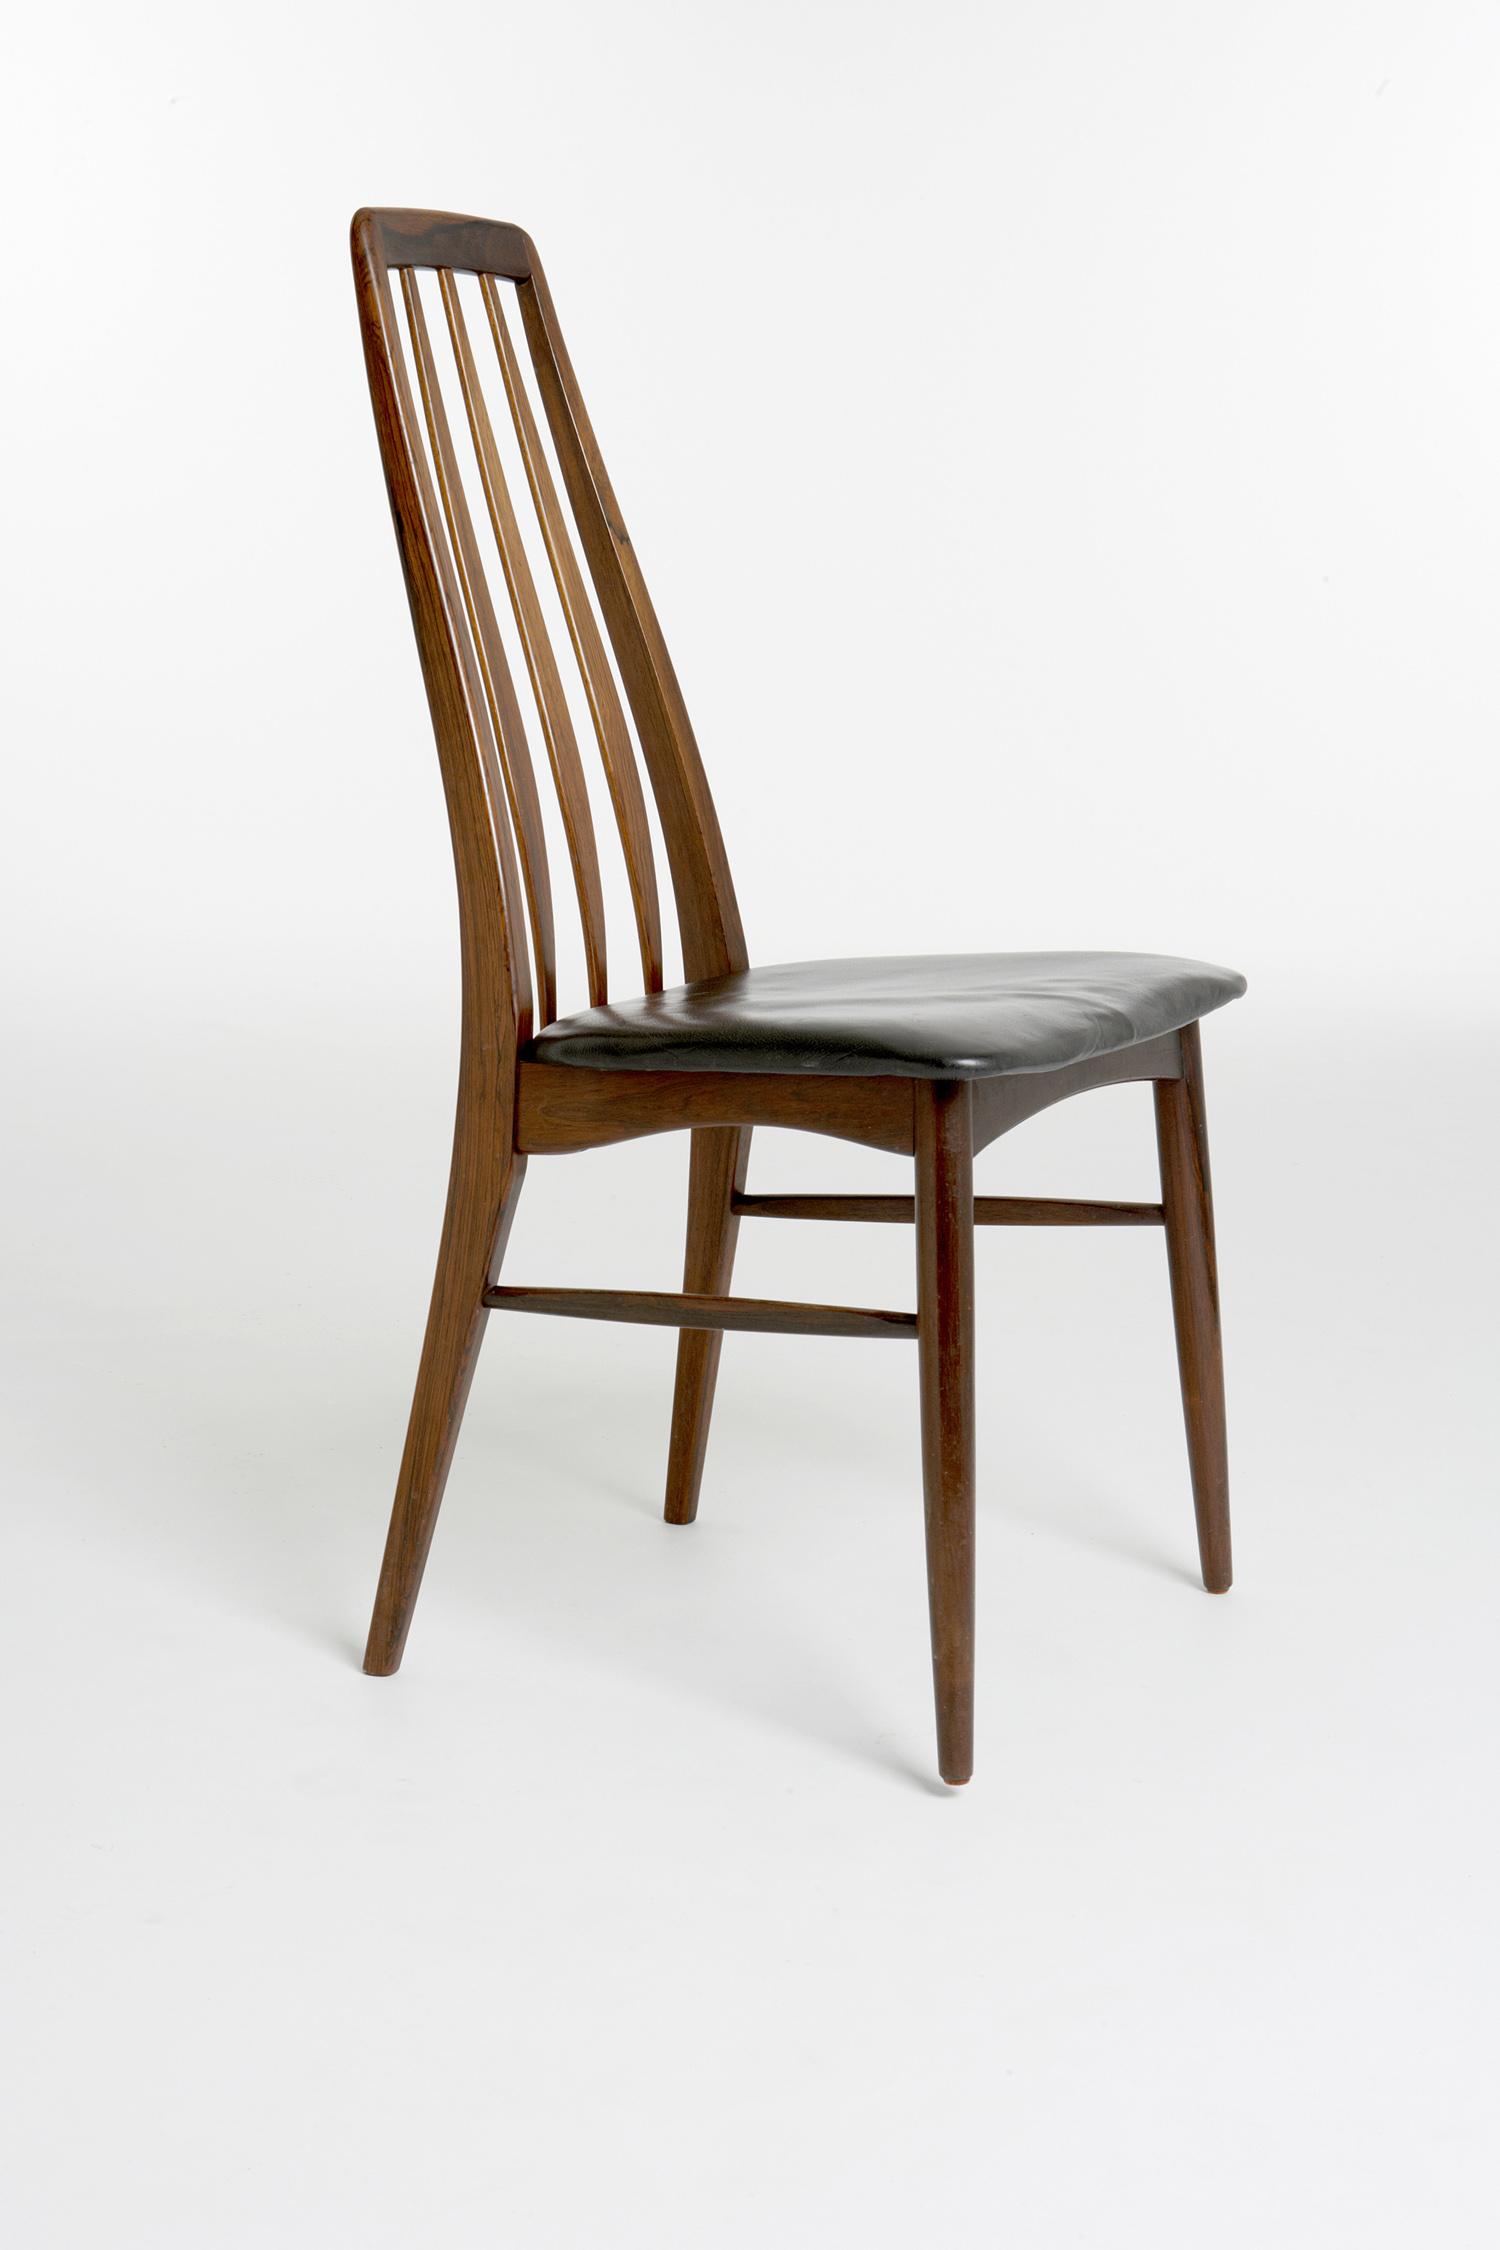 N Kofoed 1964 Spindleback Dining Chair   • made 1964-69•